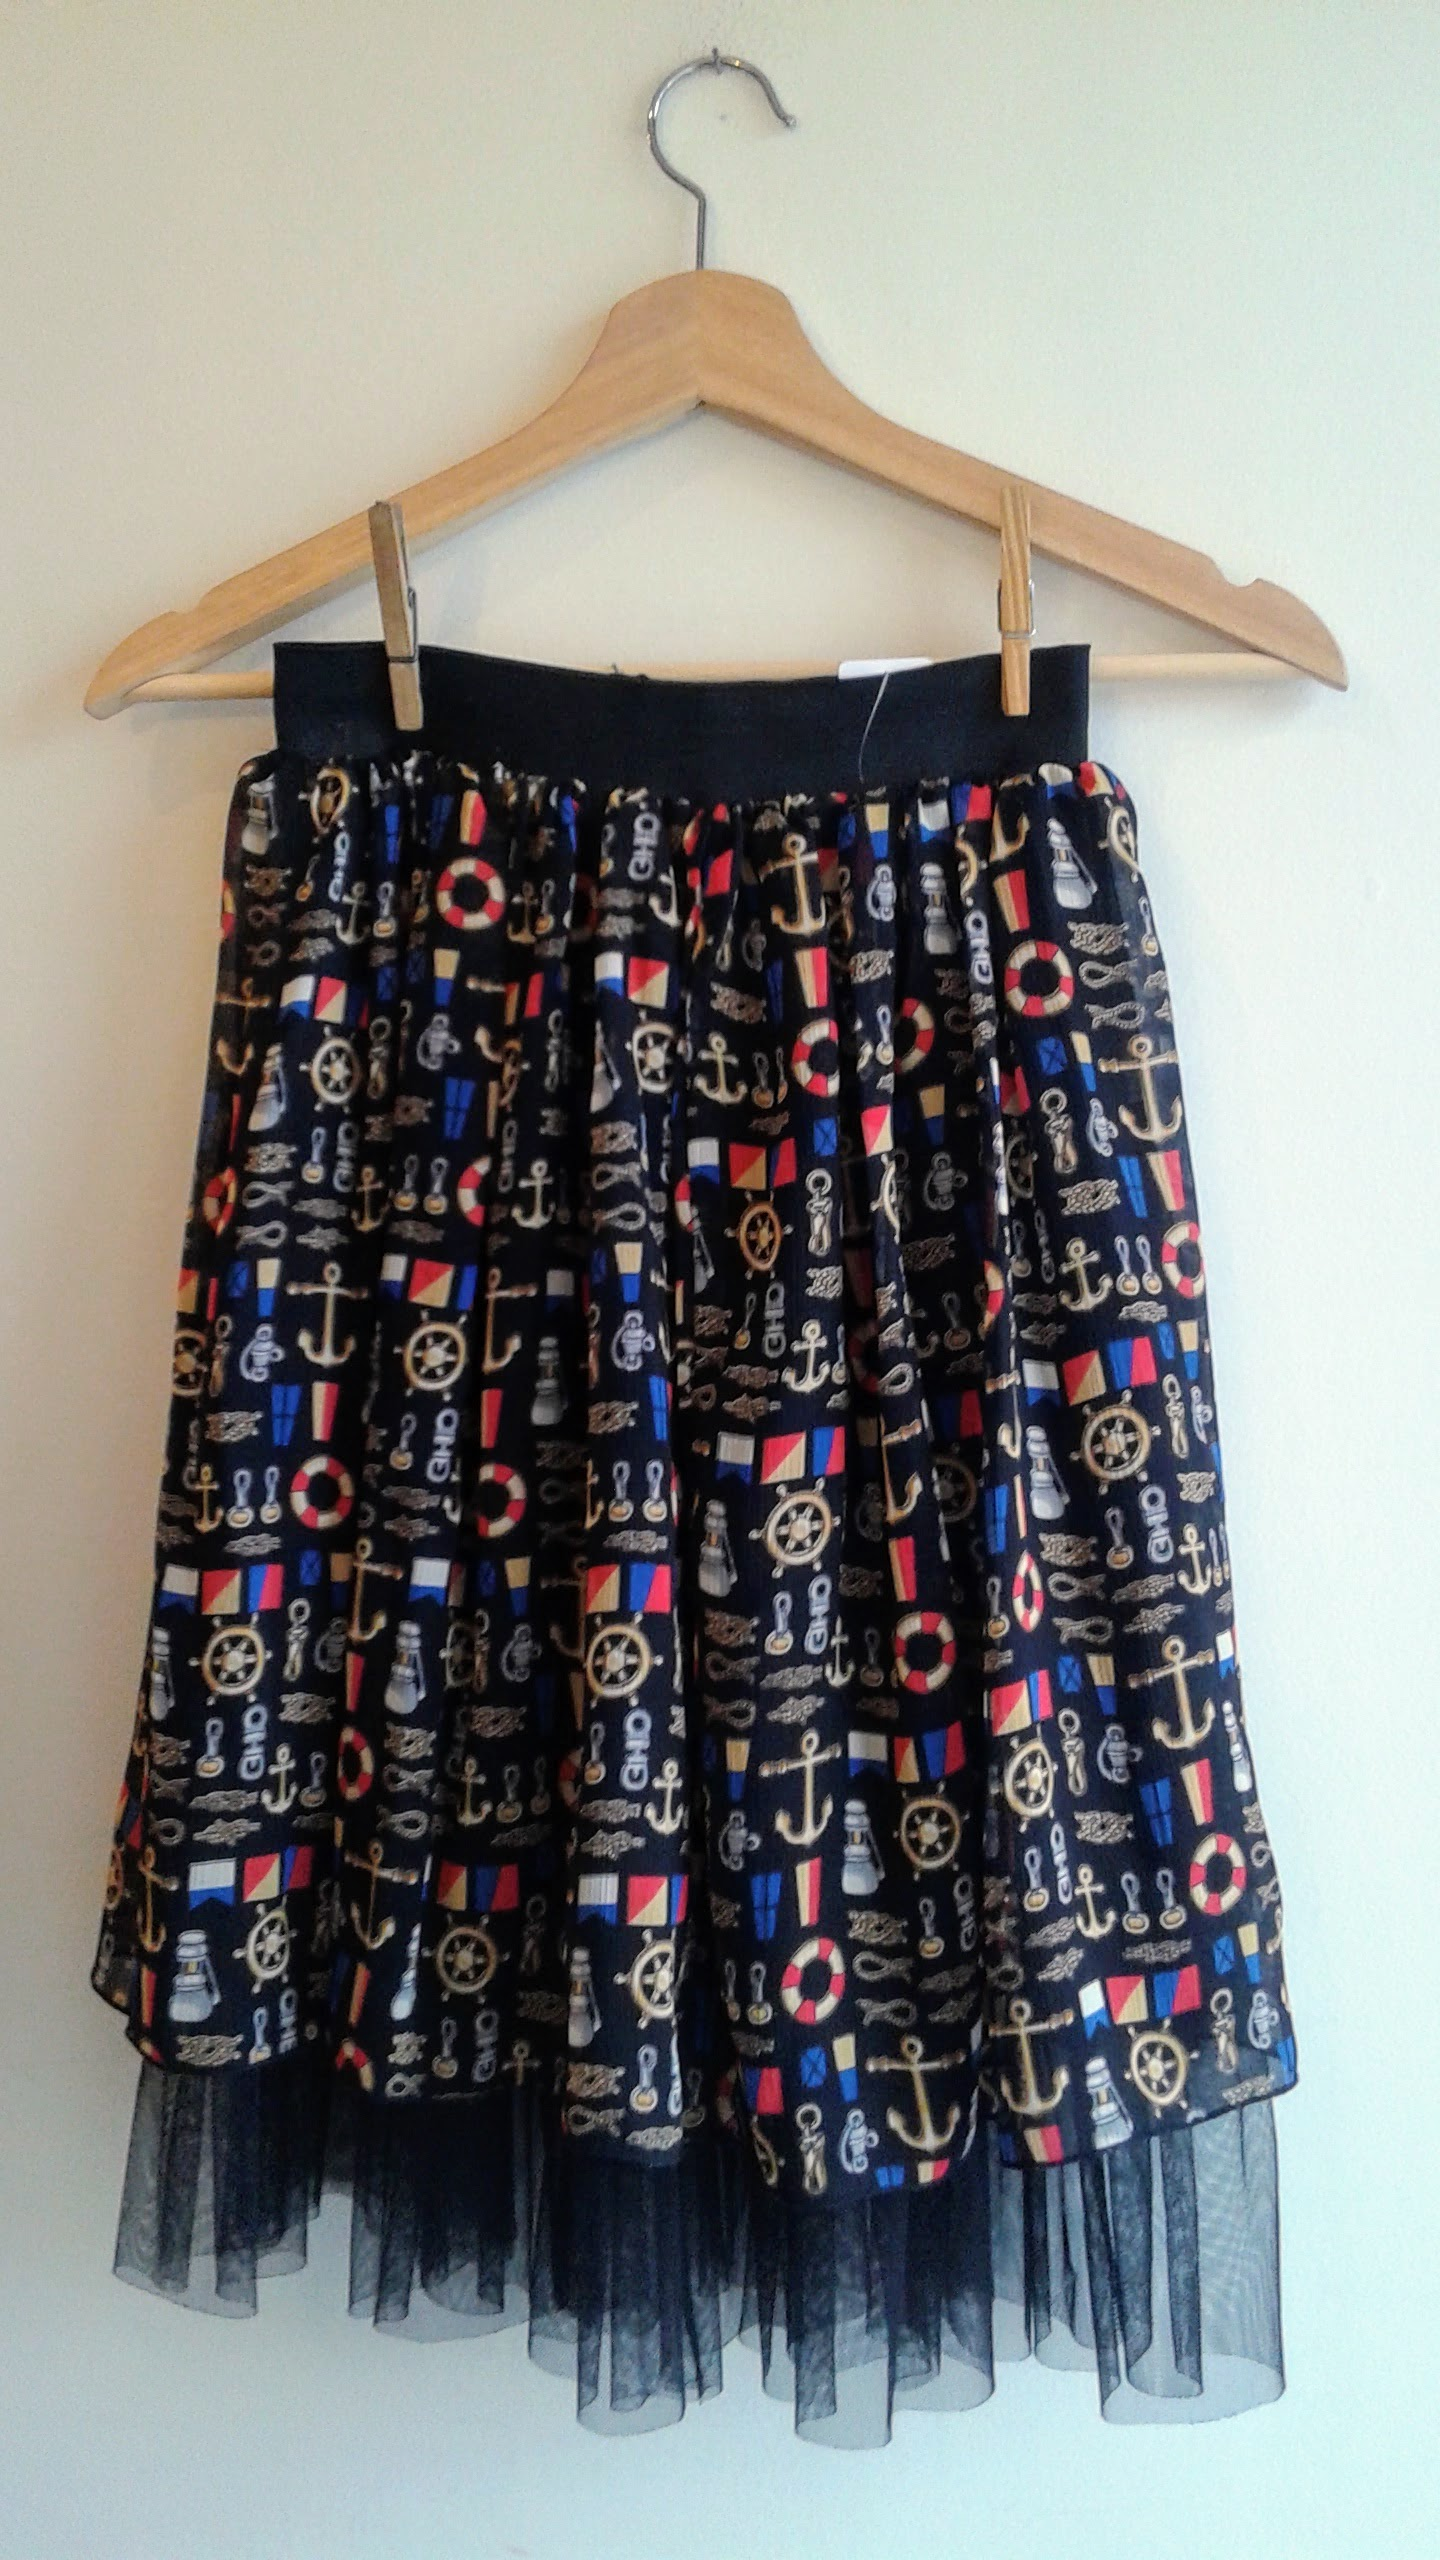 Nautical skirt; Size S, $20